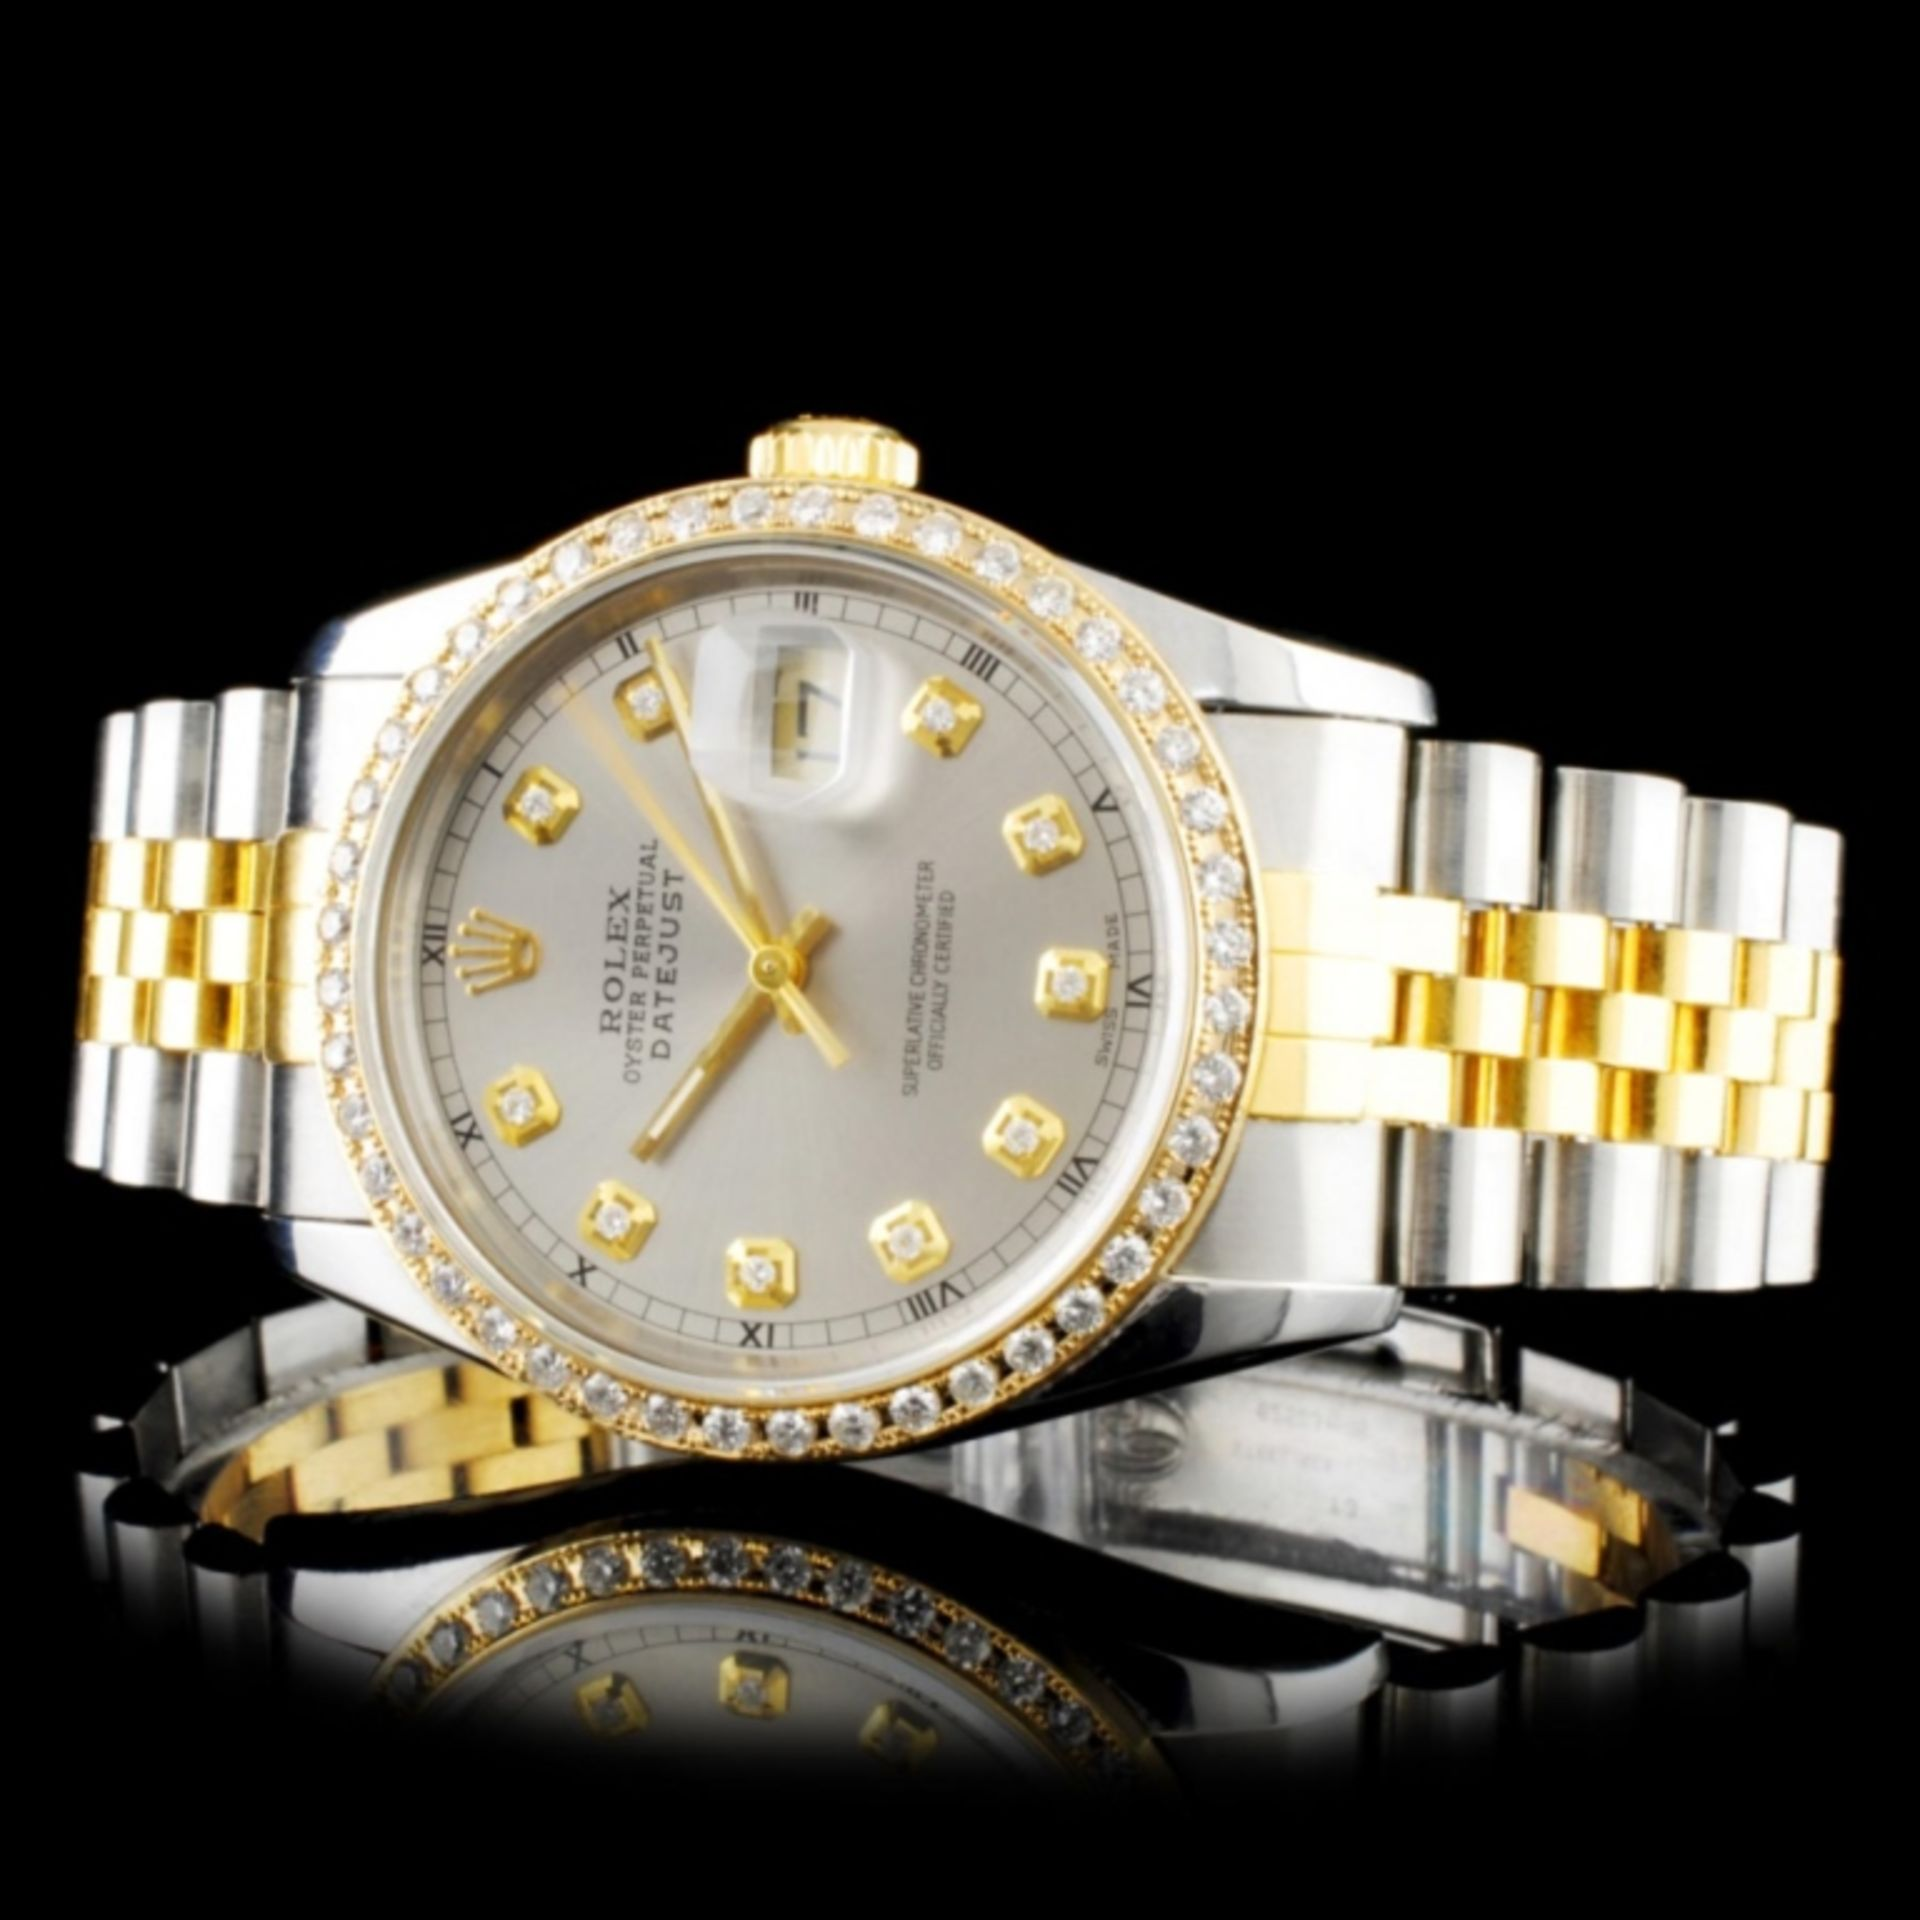 Rolex DateJust Diamond 36MM Wristwatch - Image 2 of 6